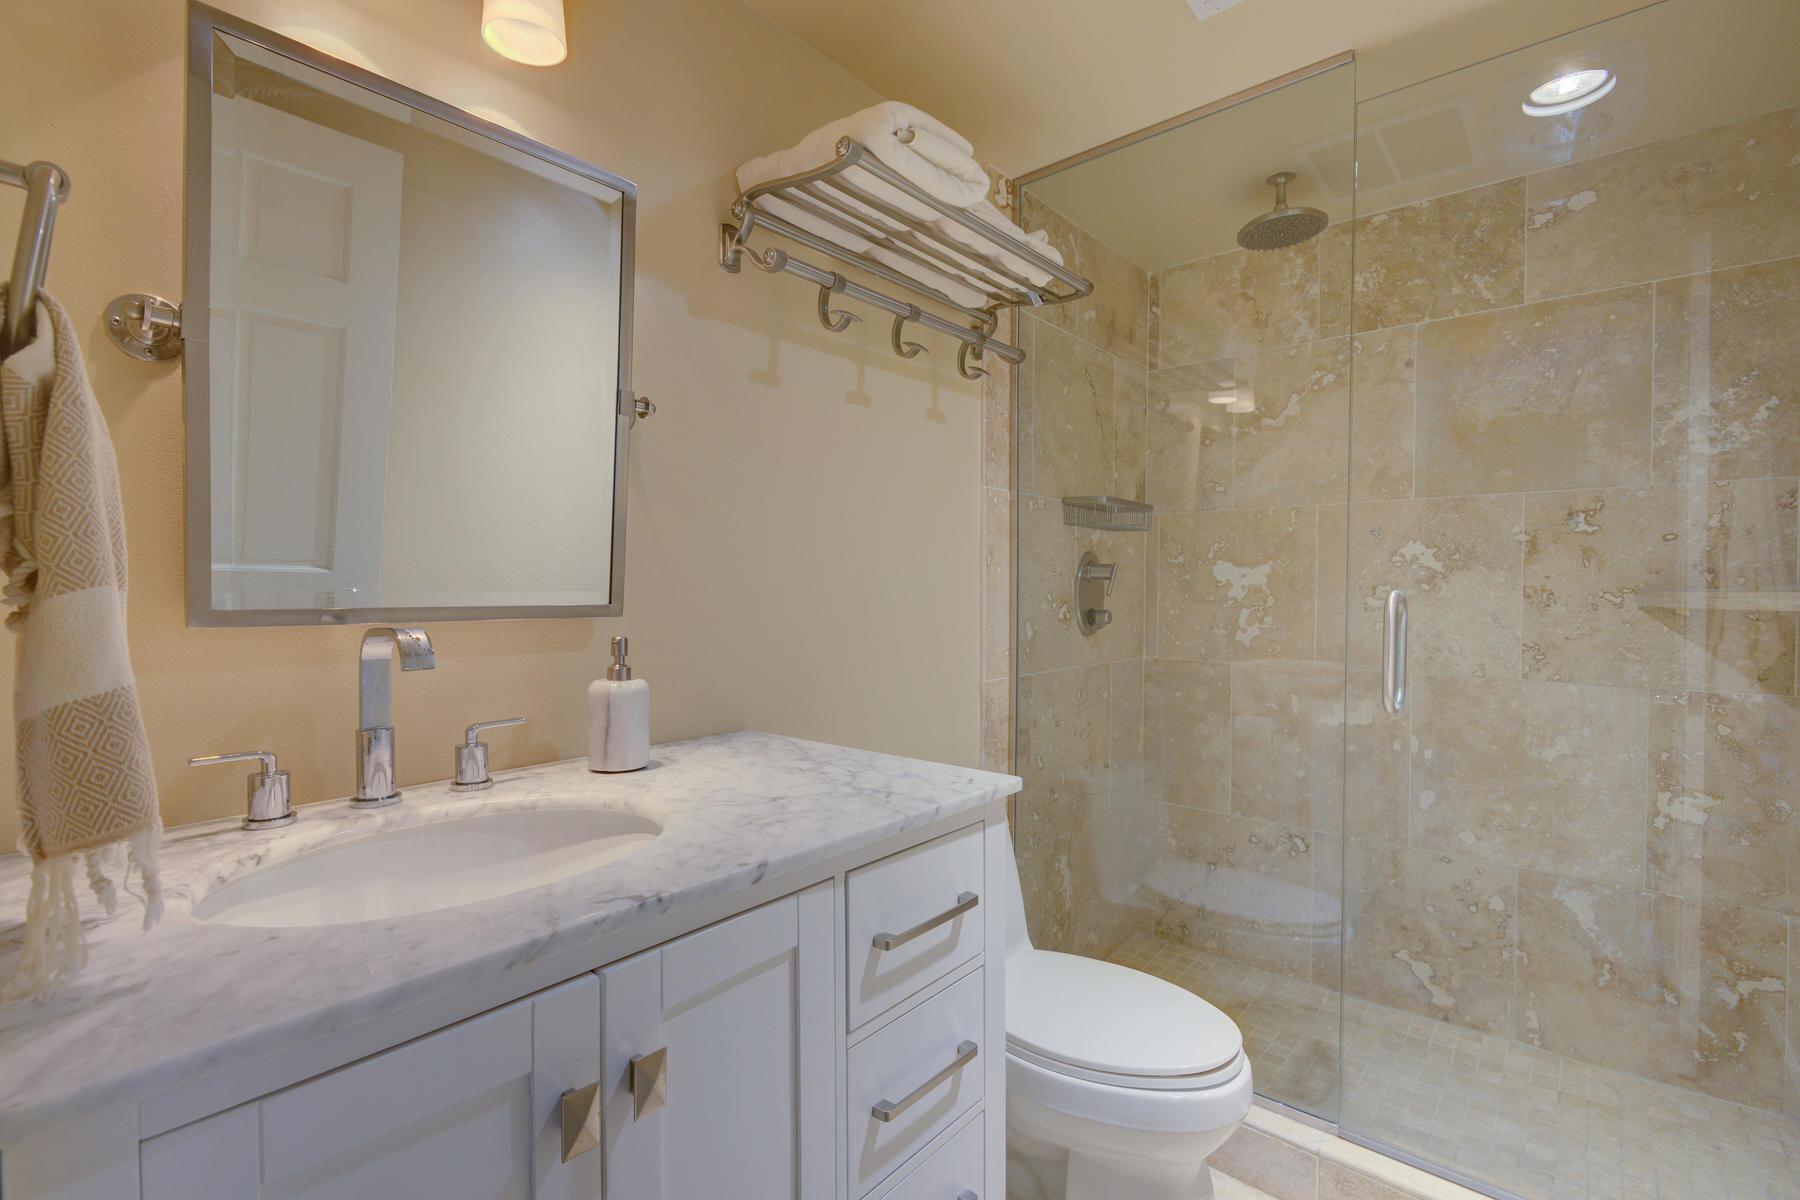 1512 Larimer Street-031-021-Bathroom-MLS_Size.jpg